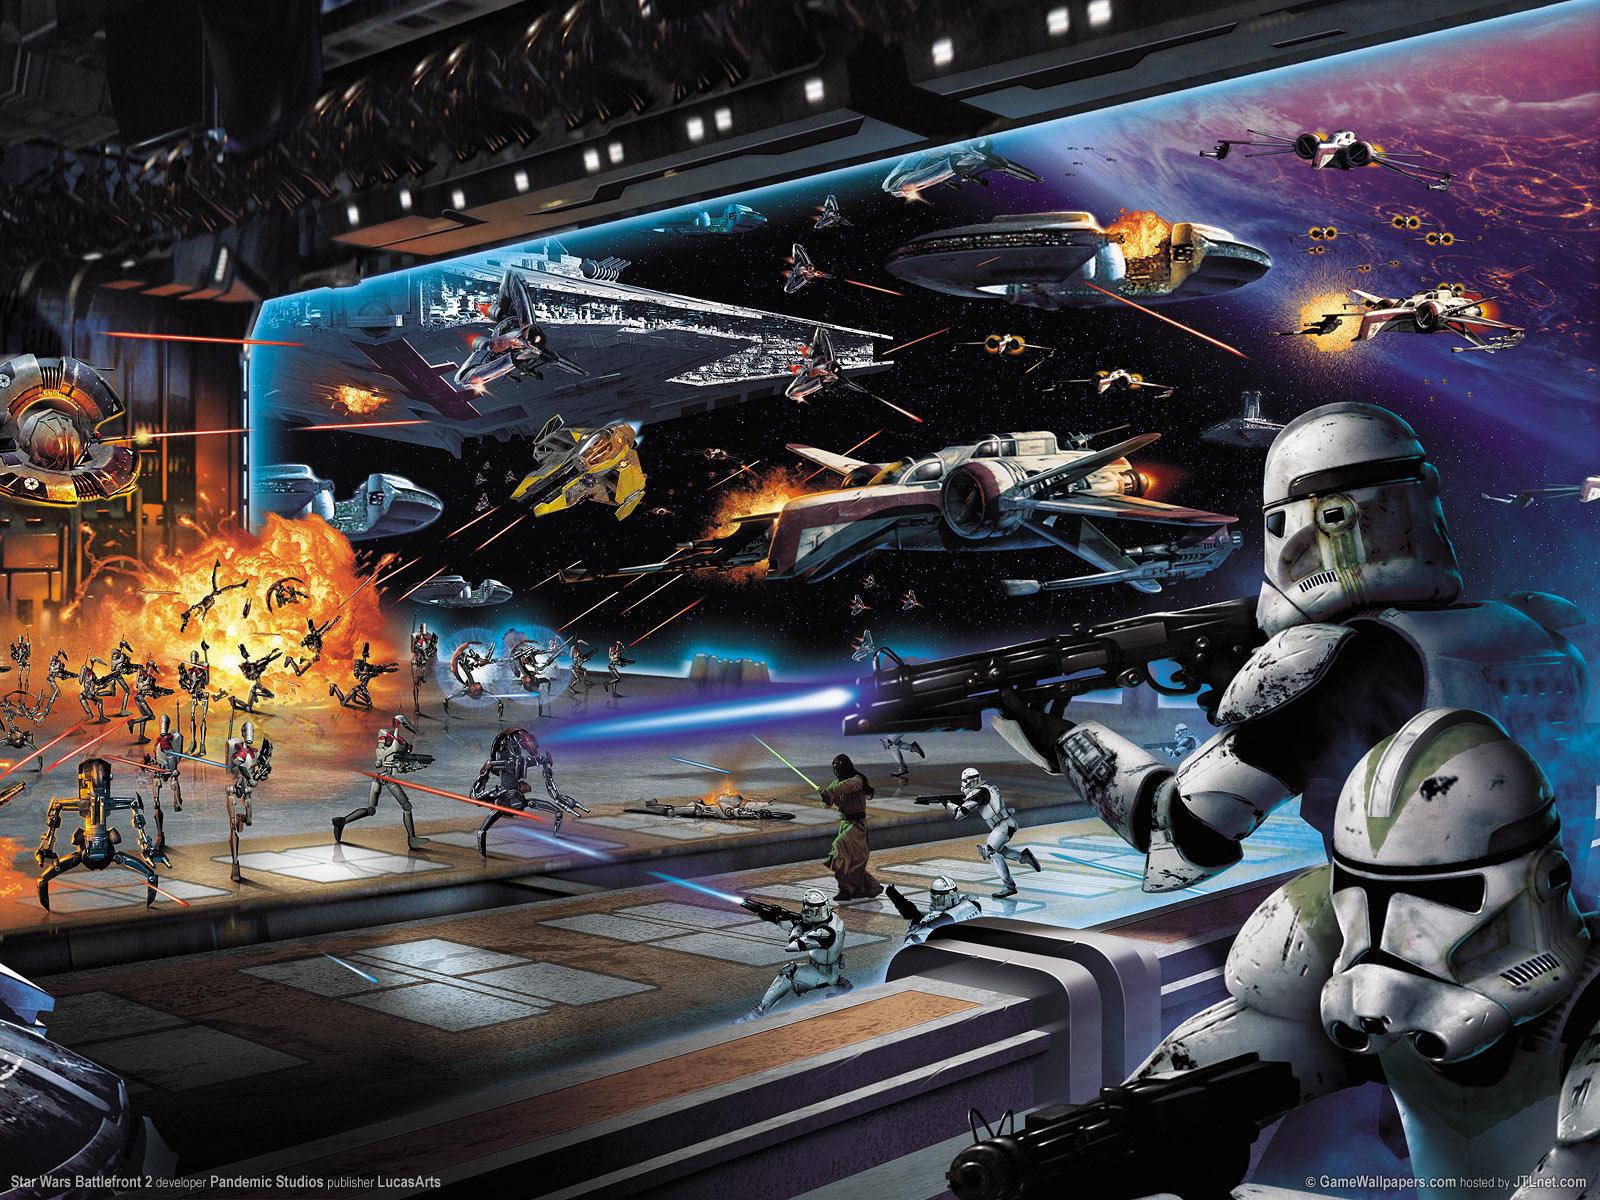 Star Wars Battlefront 2 01 1600